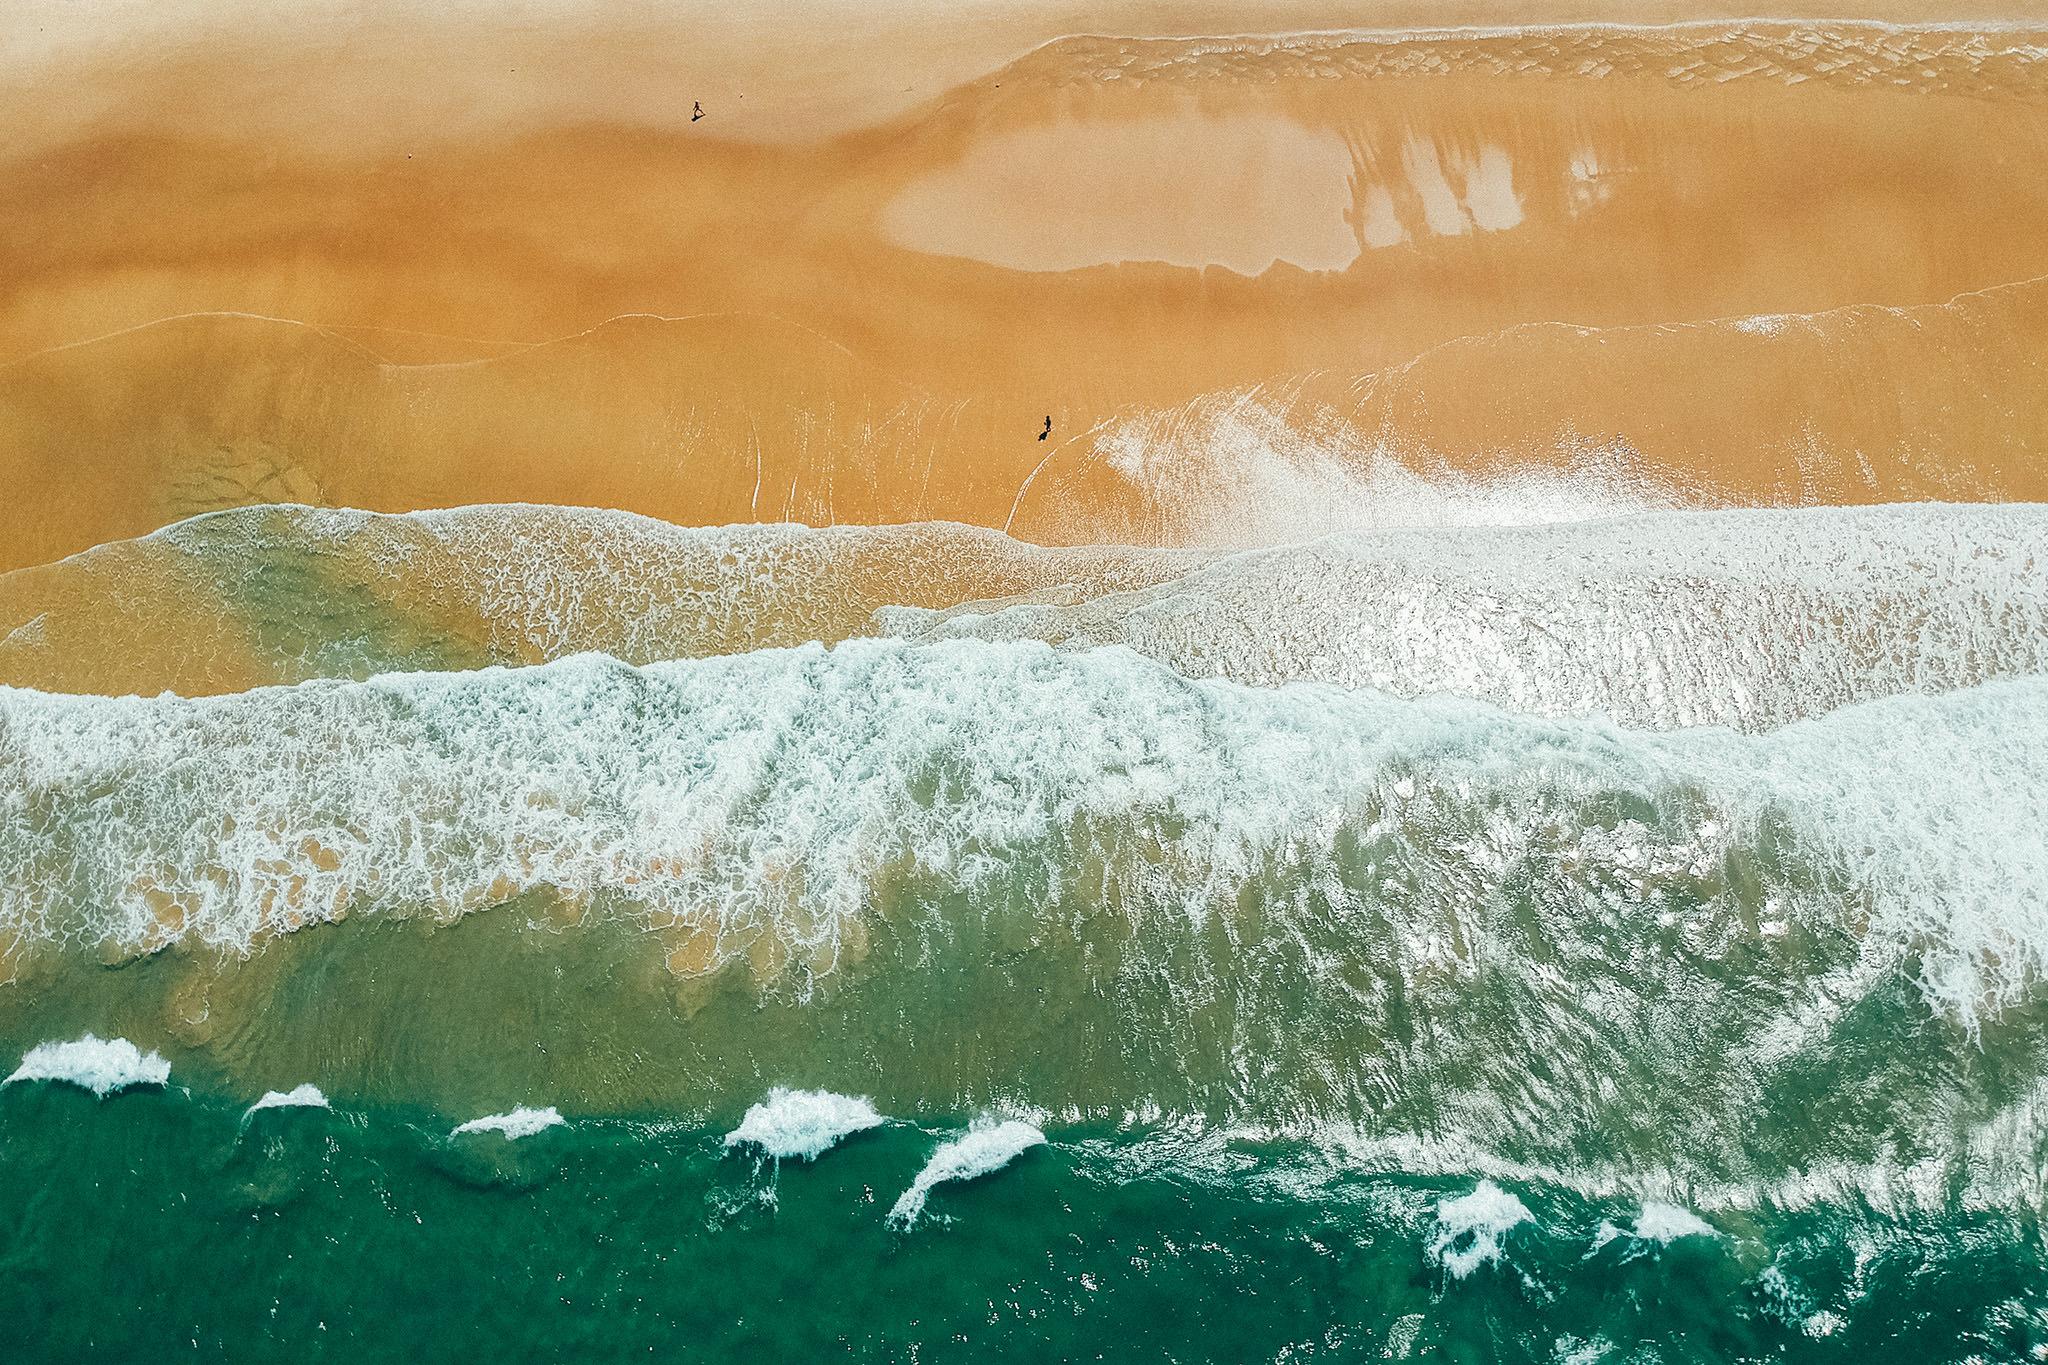 Massive Waves on Gold Coast